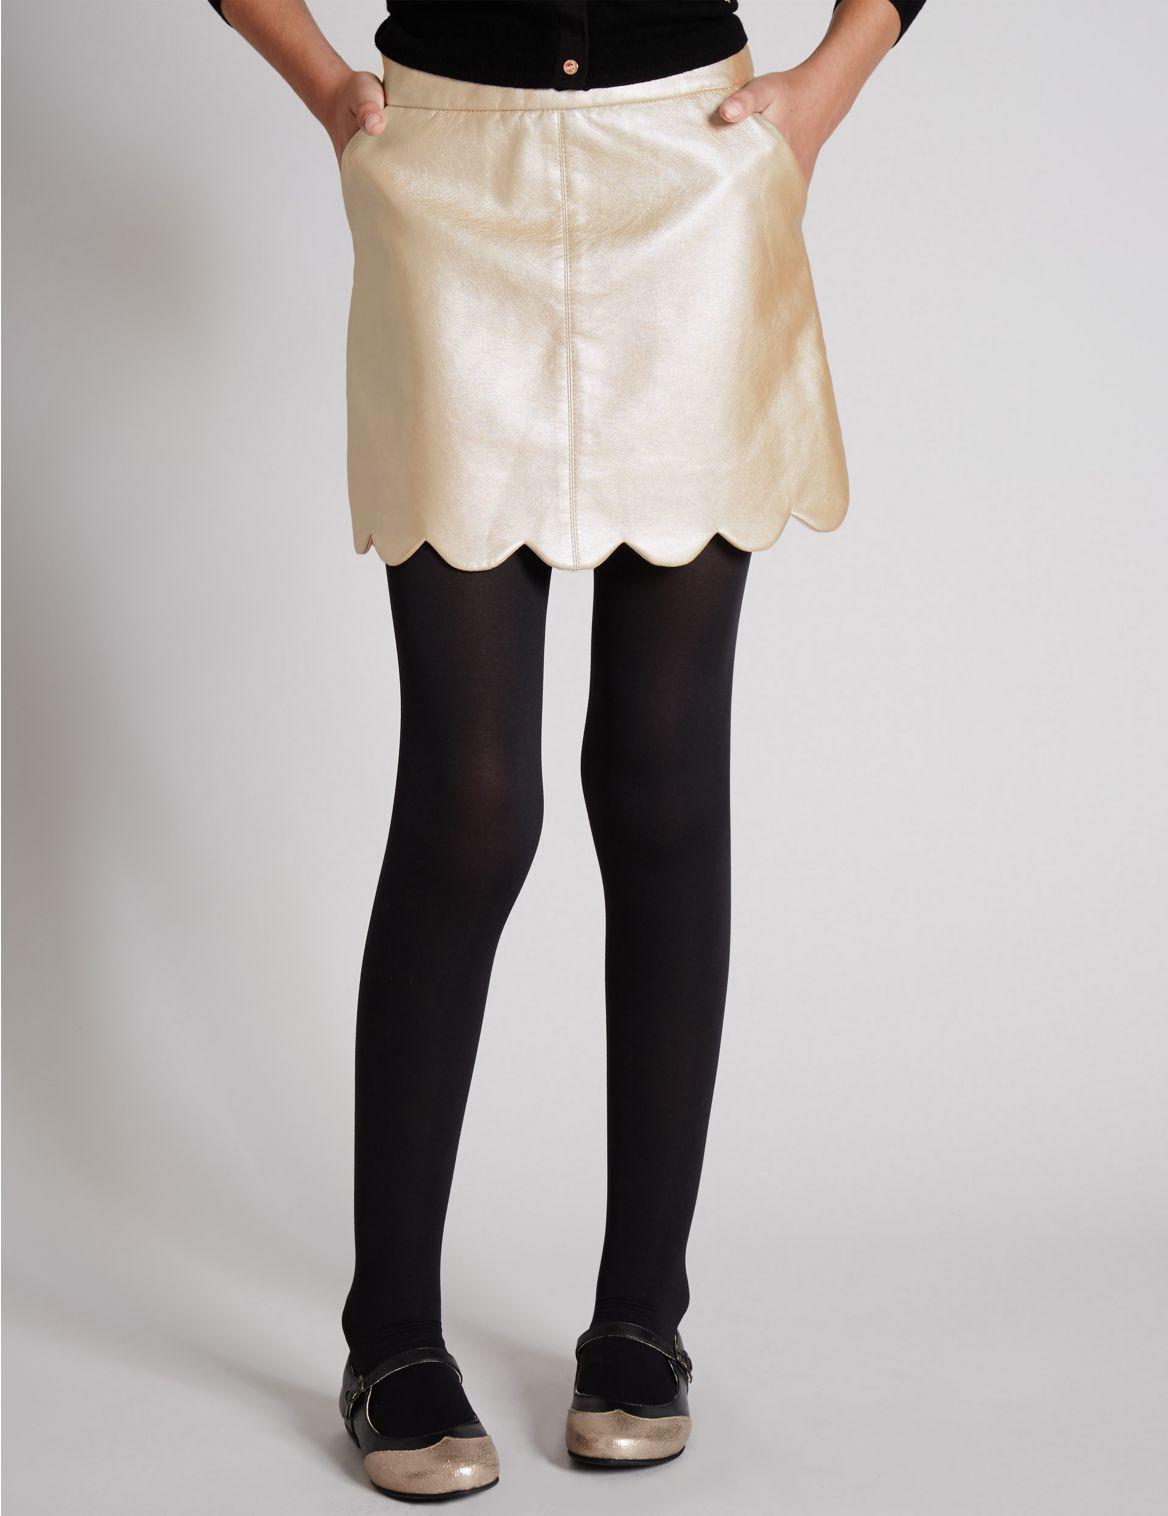 Faux Leather Metallic ALine Skirt